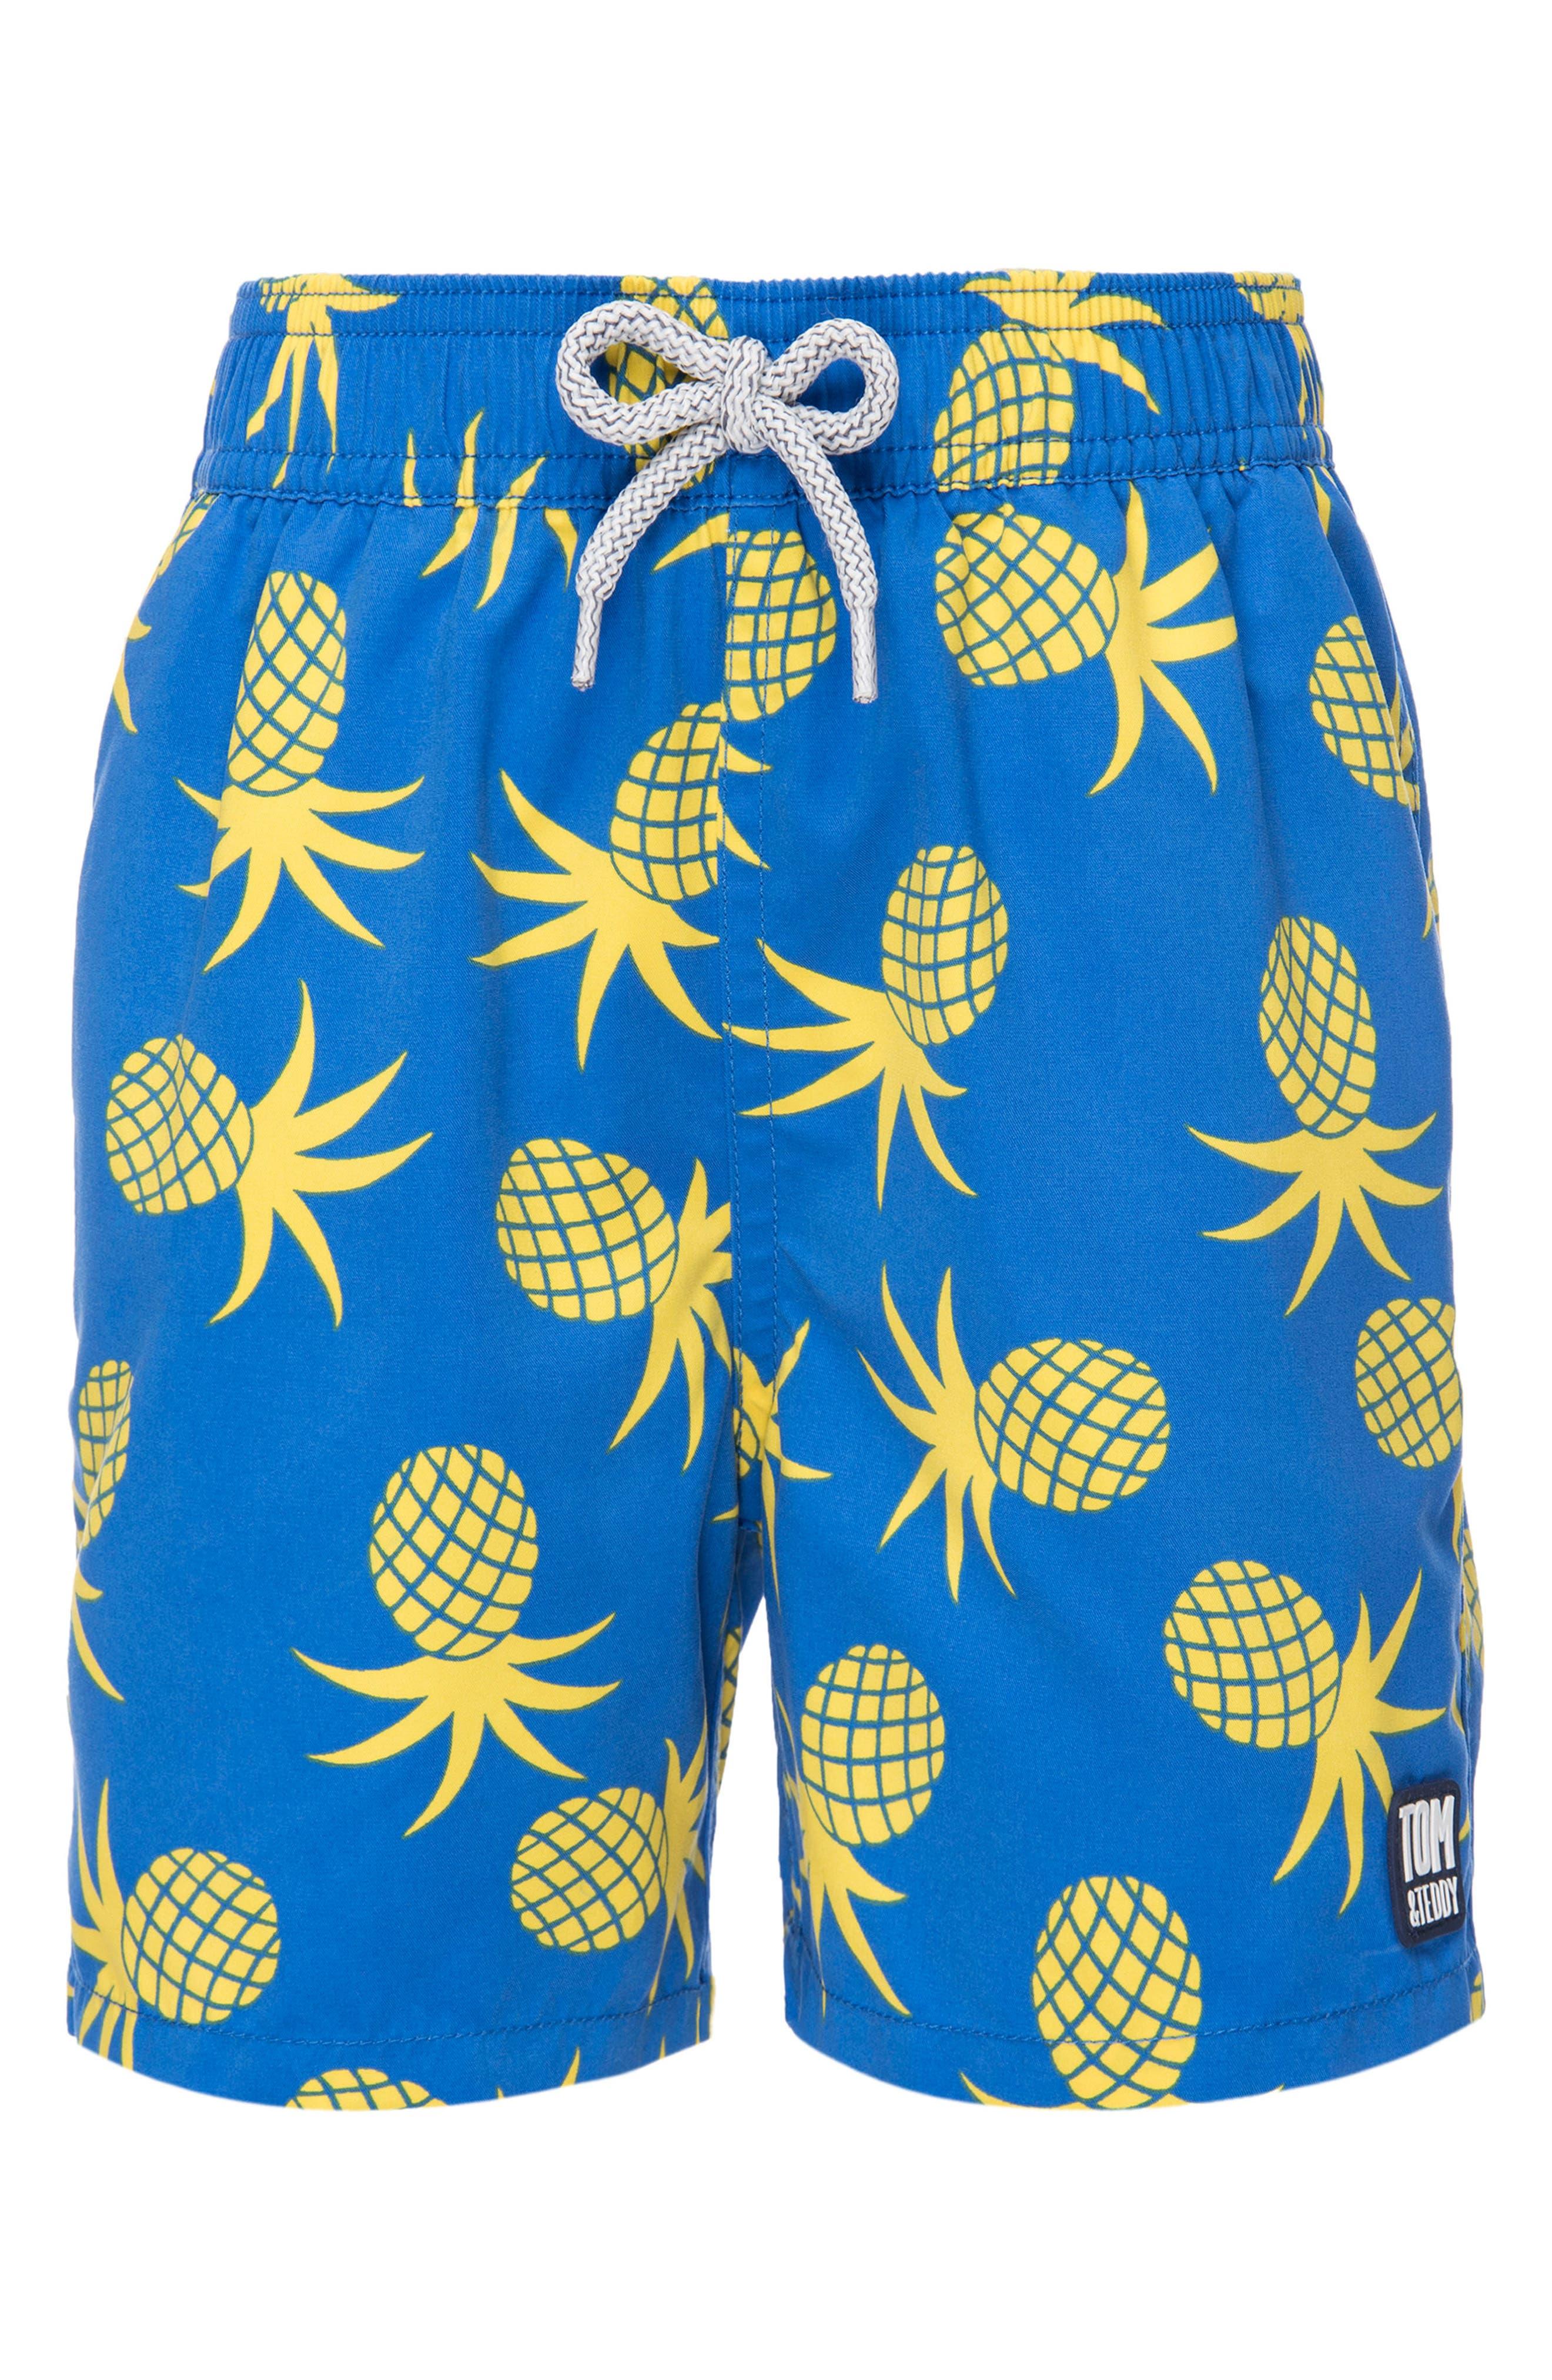 Tom & Teddy Pineapple Swim Trunks (Toddler Boys, Little Boys & Big Boys)